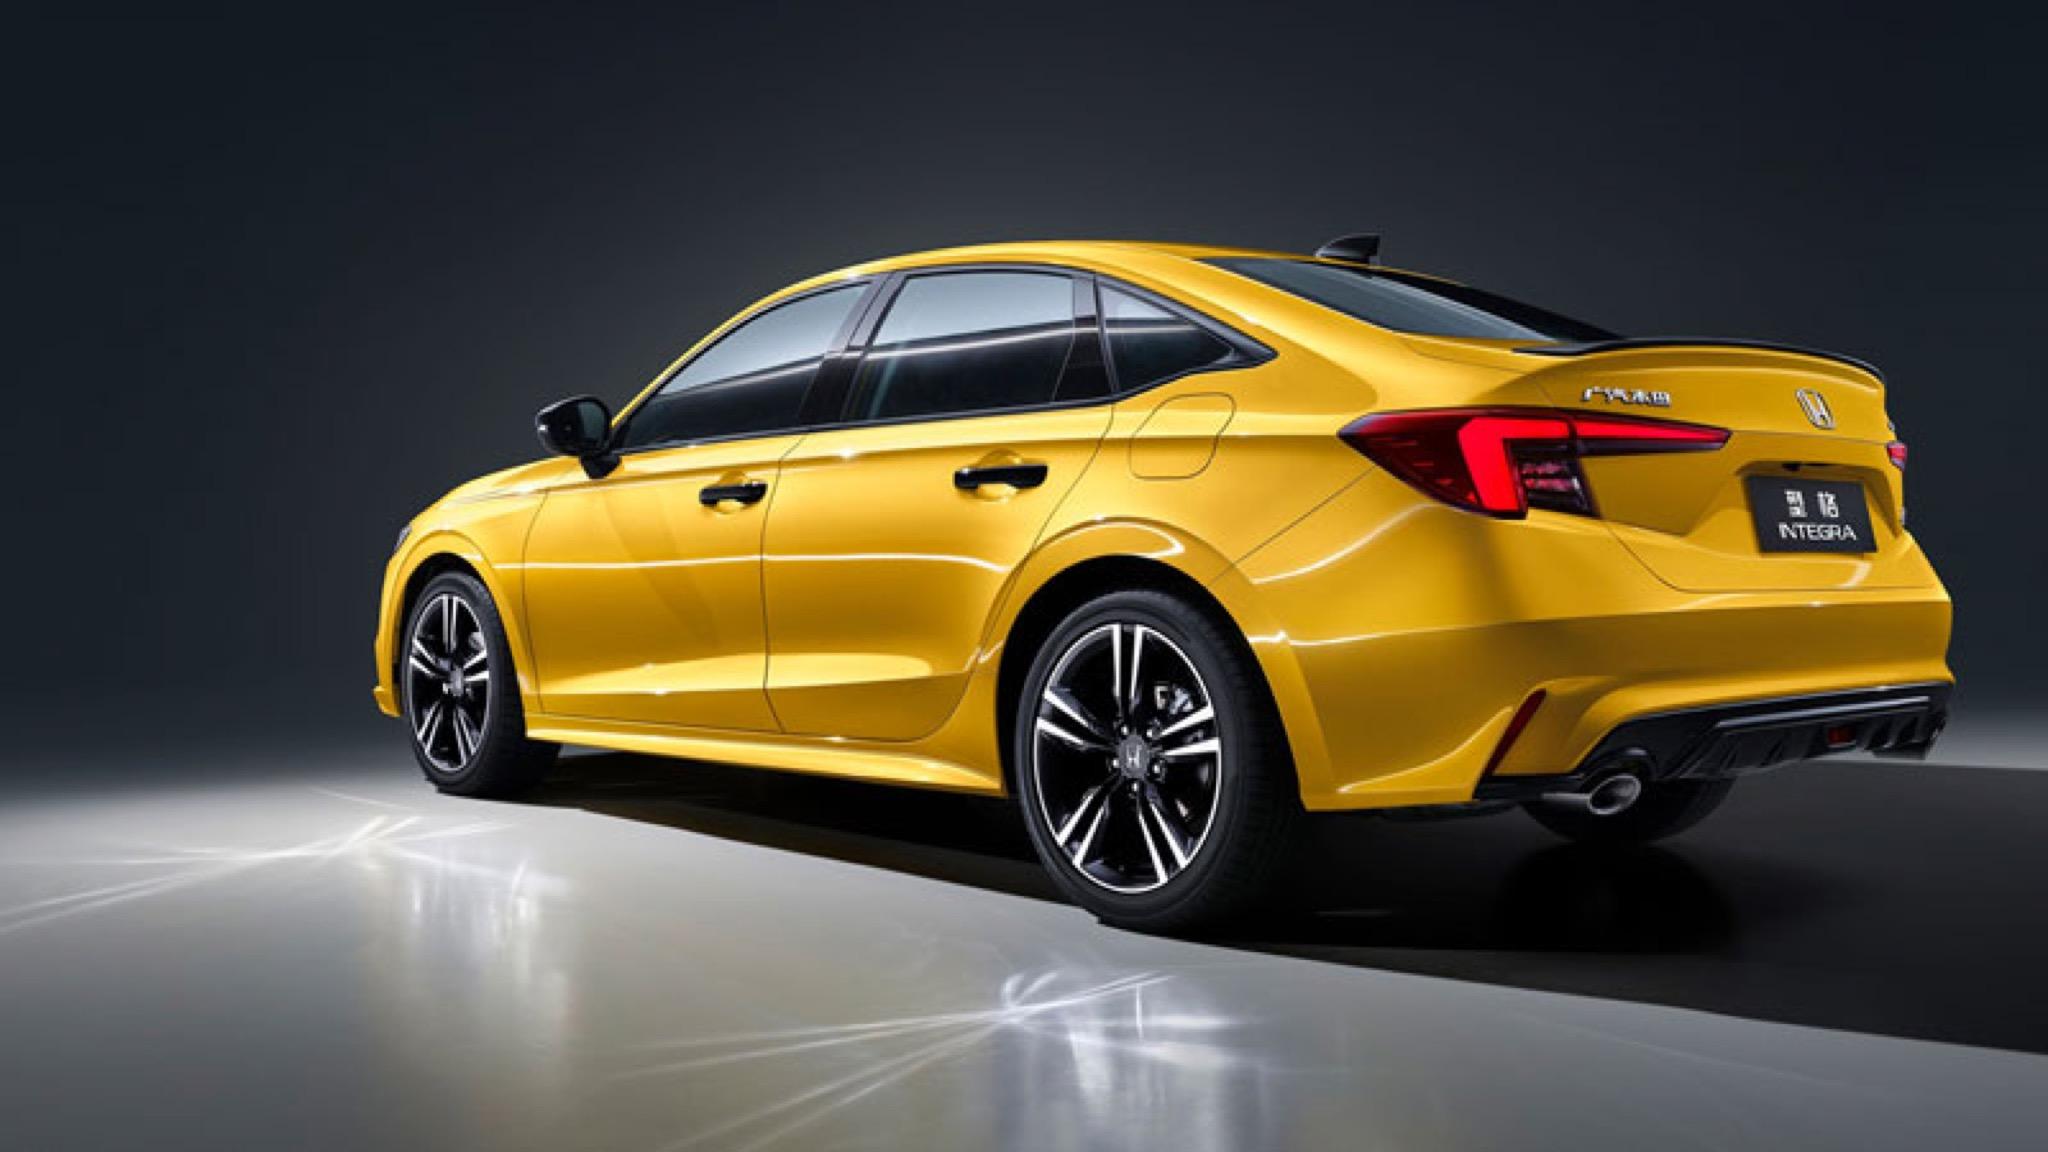 GAC Honda Integra 9